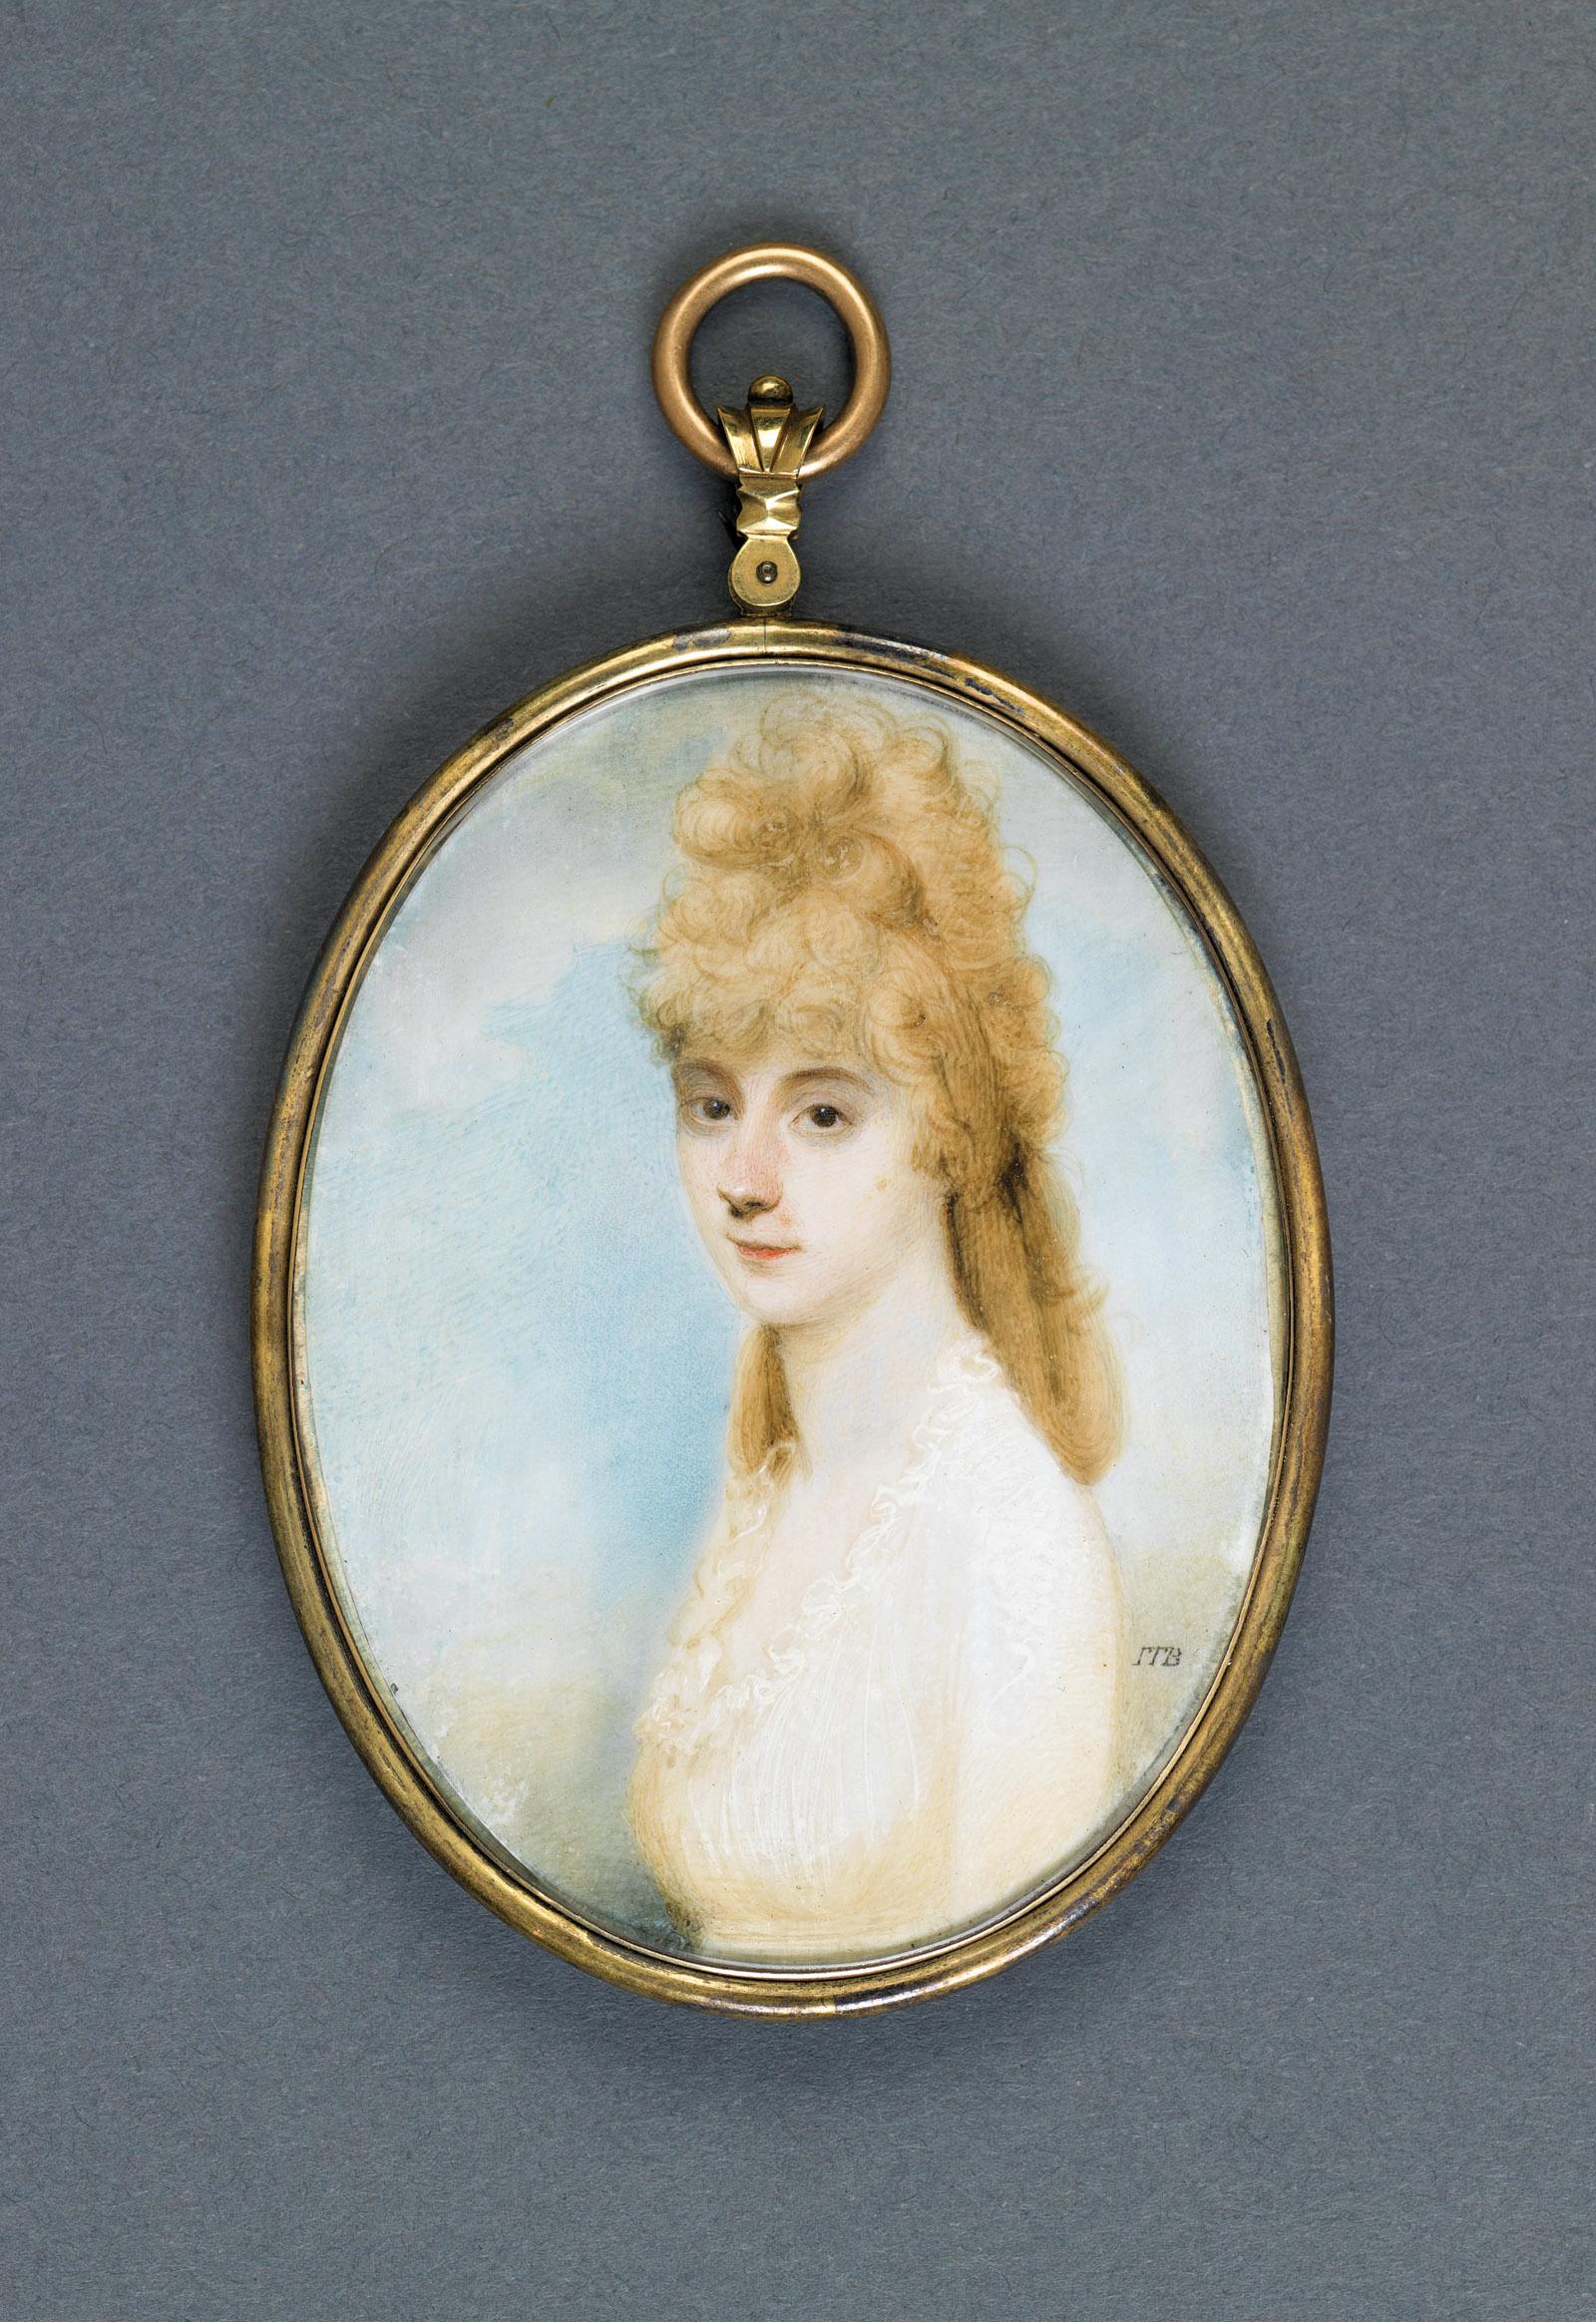 Louisa Adams; miniature painting by John Thomas Barber Beaumont, 1797